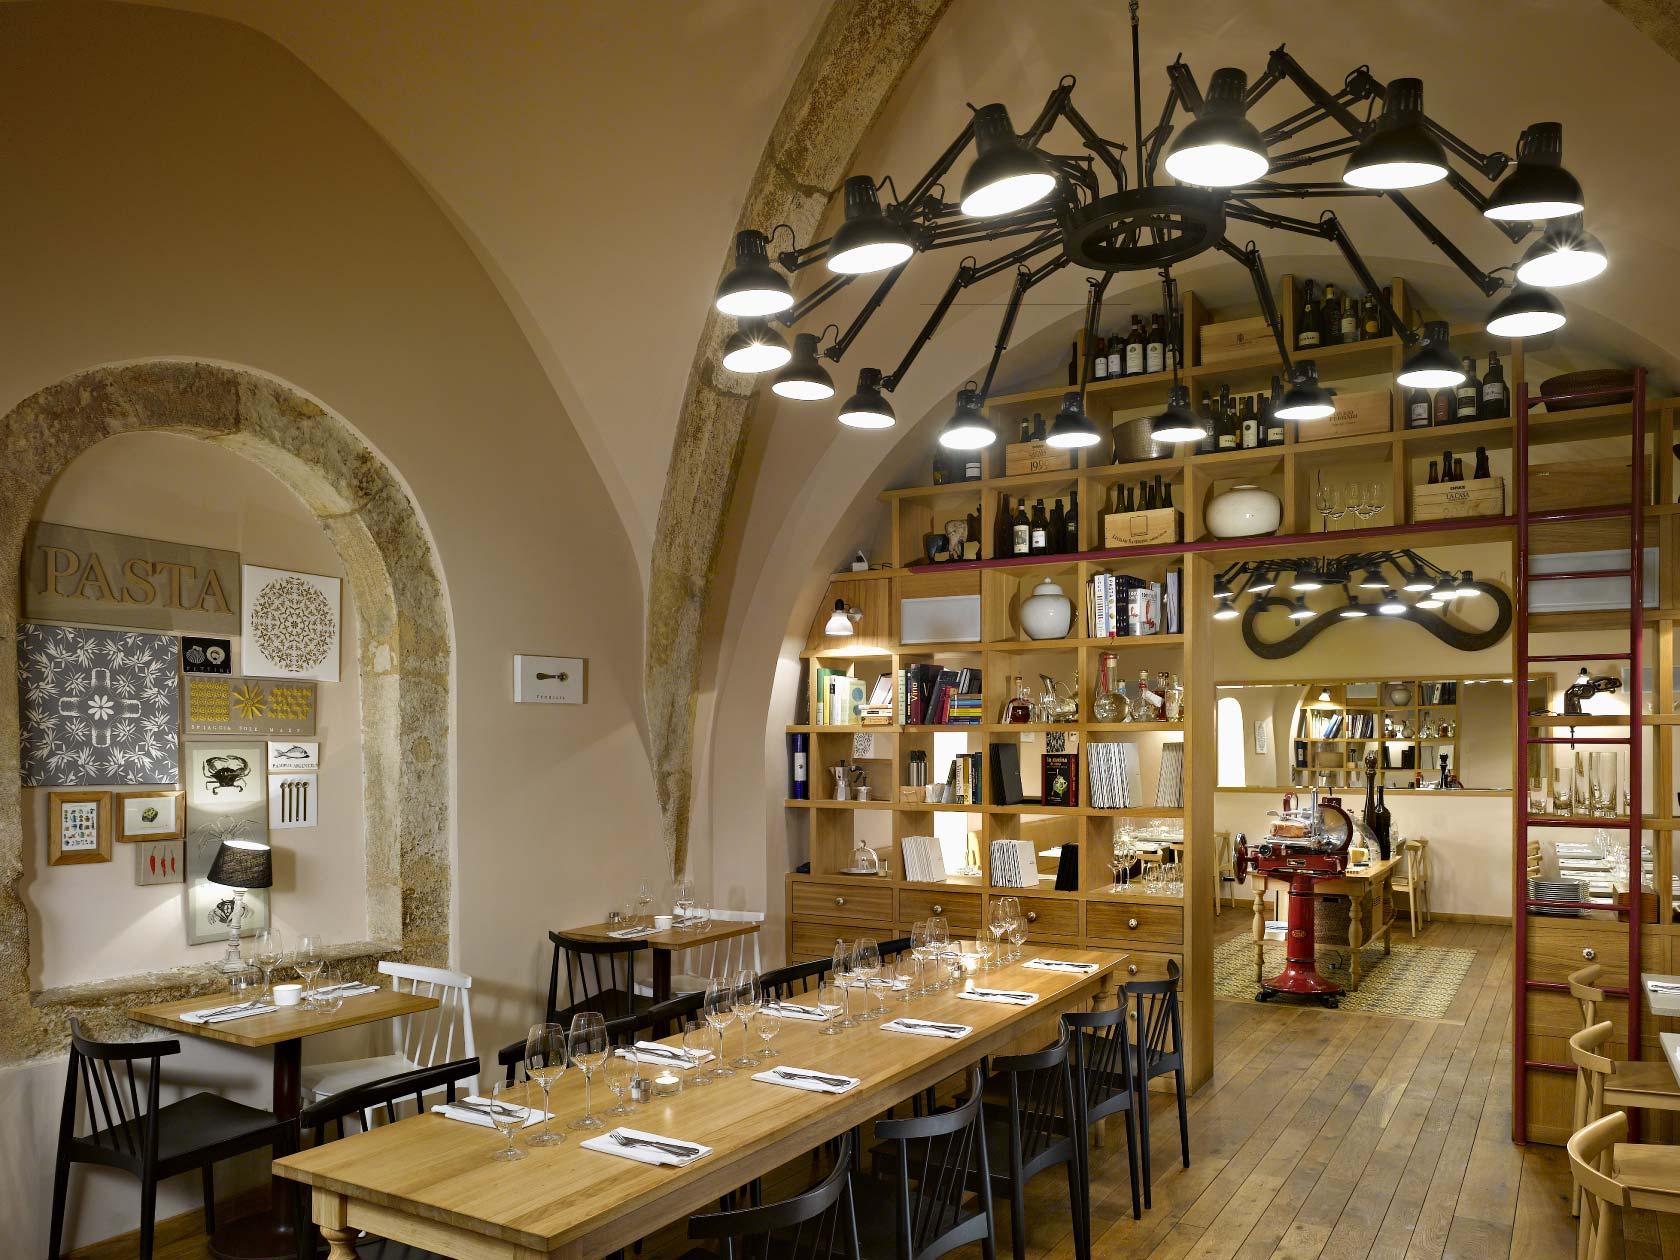 Italian Restaurant Pasta Fresca Ambiente